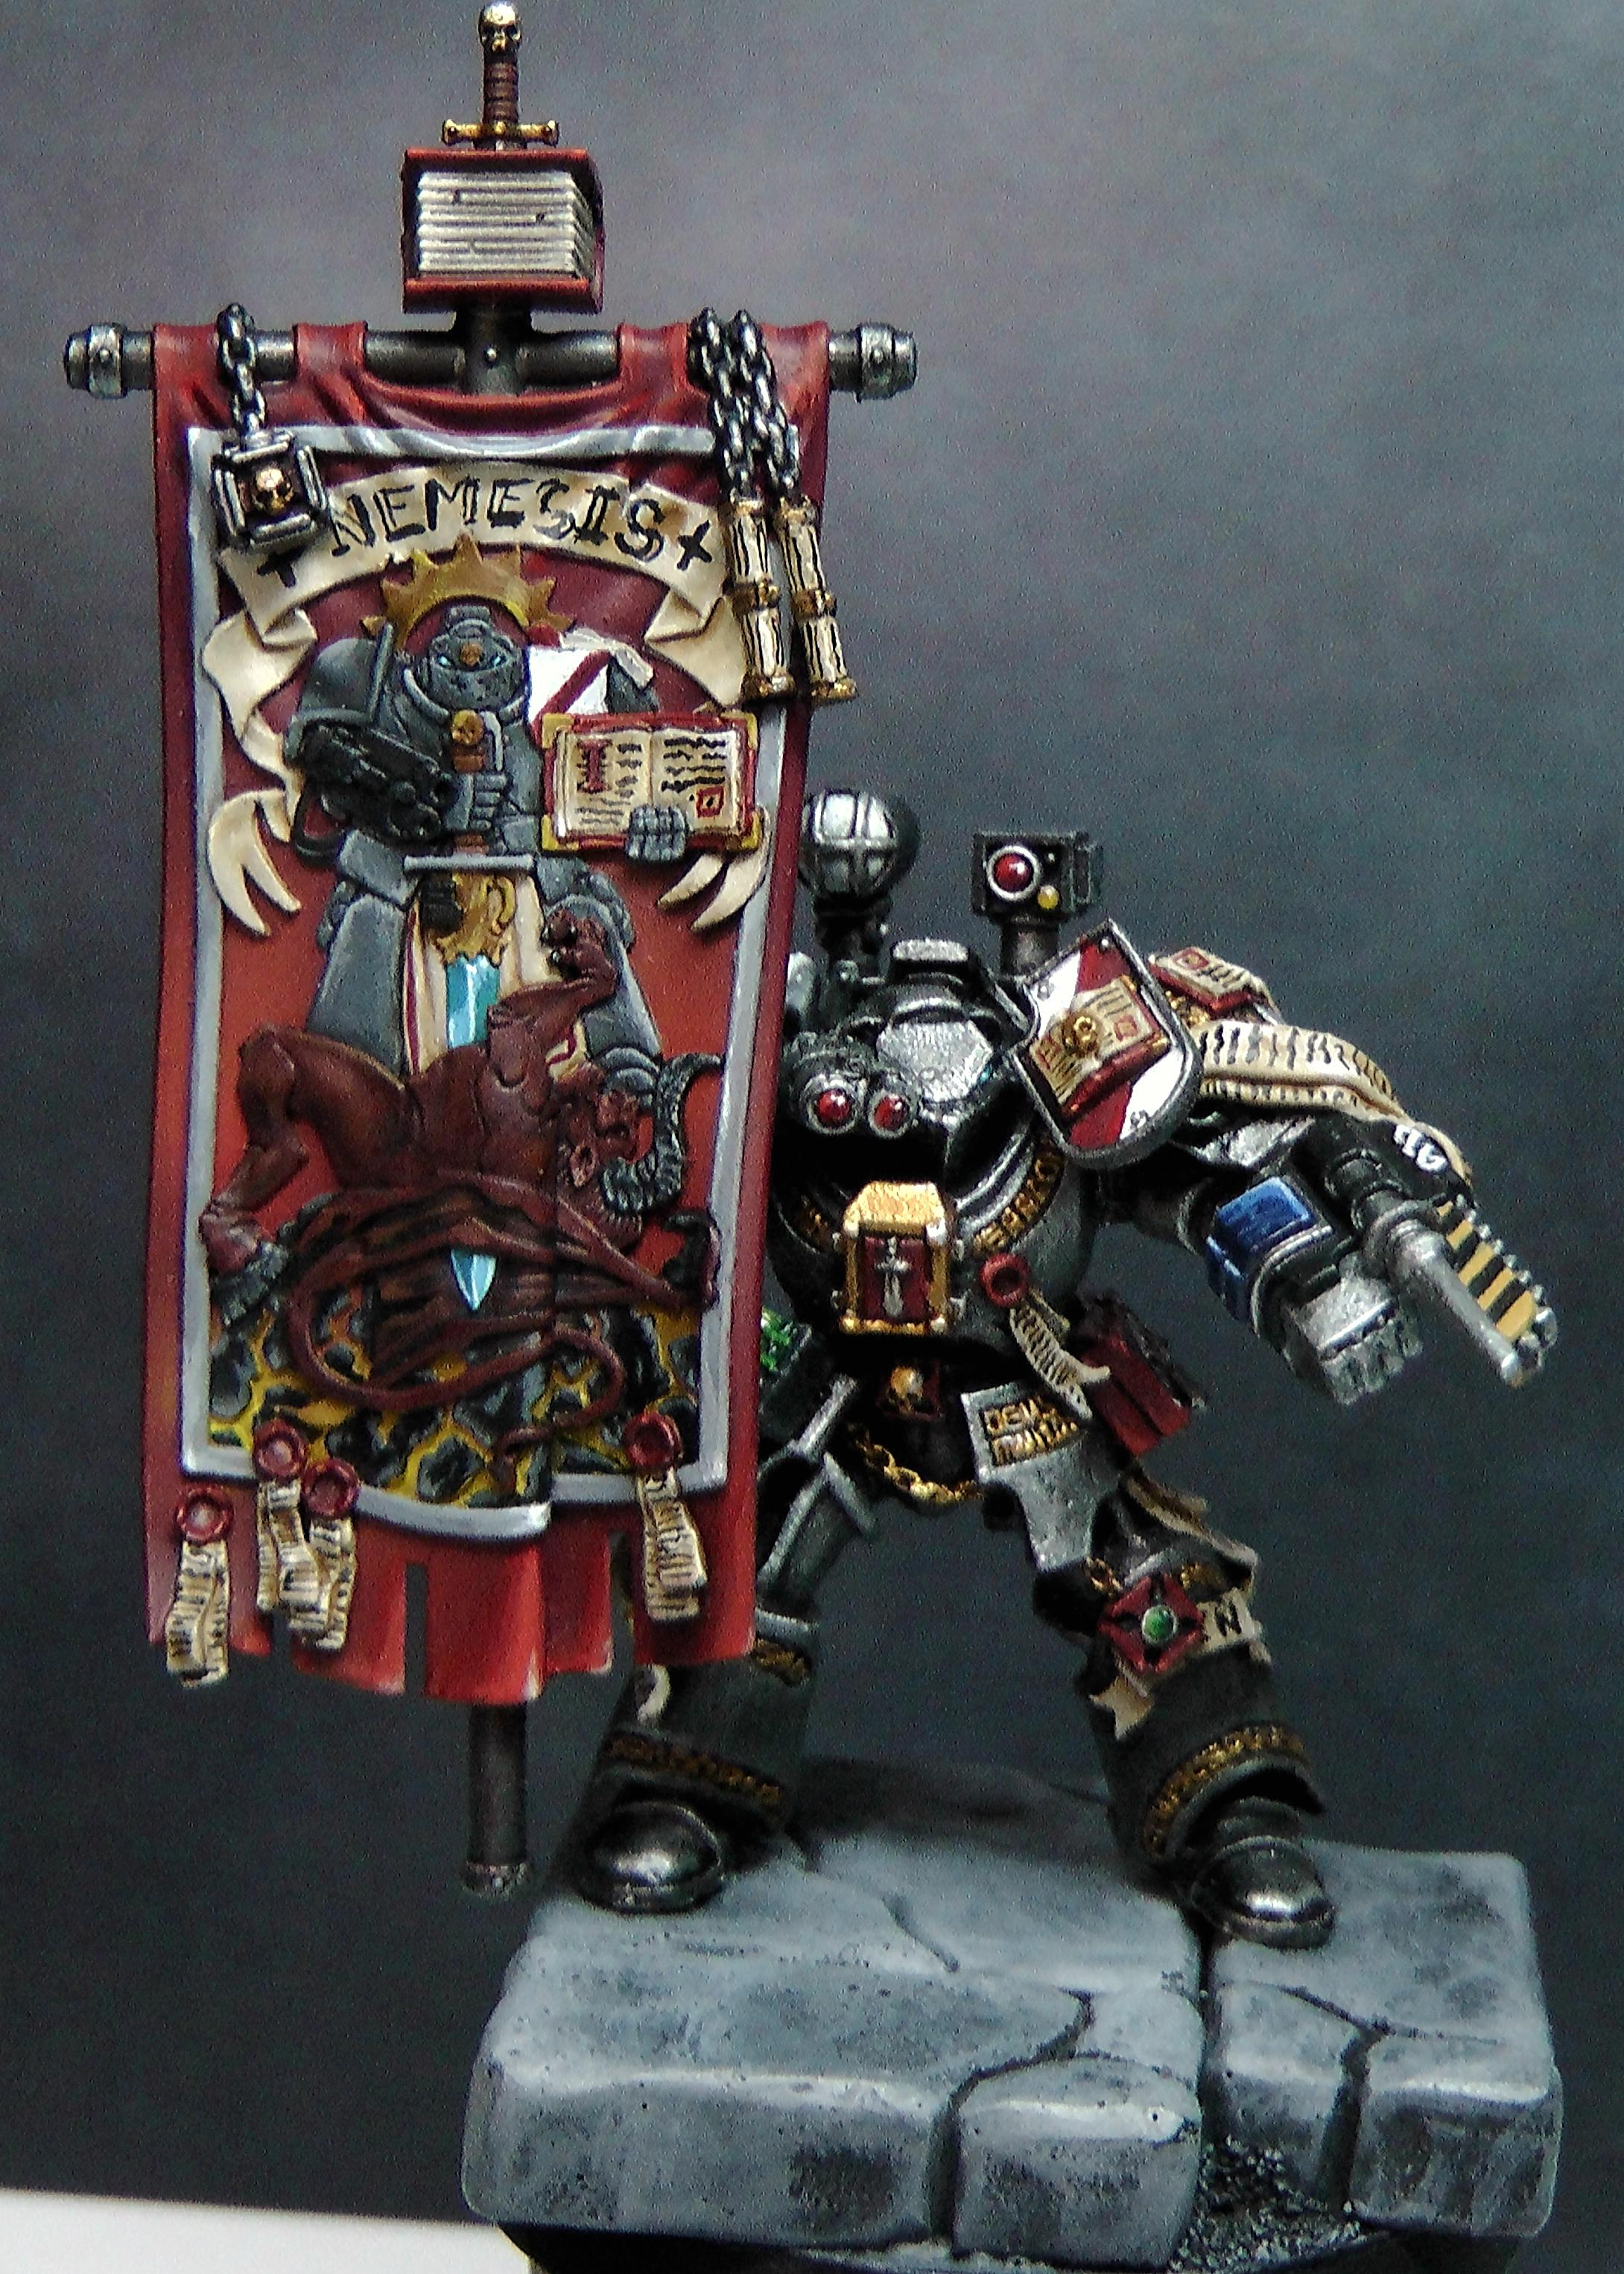 Astartes, Banner, Bearer, Grey, Grey Knights, Knights, Nemesis, Terminator Armor, Titan, Warhammer 40,000